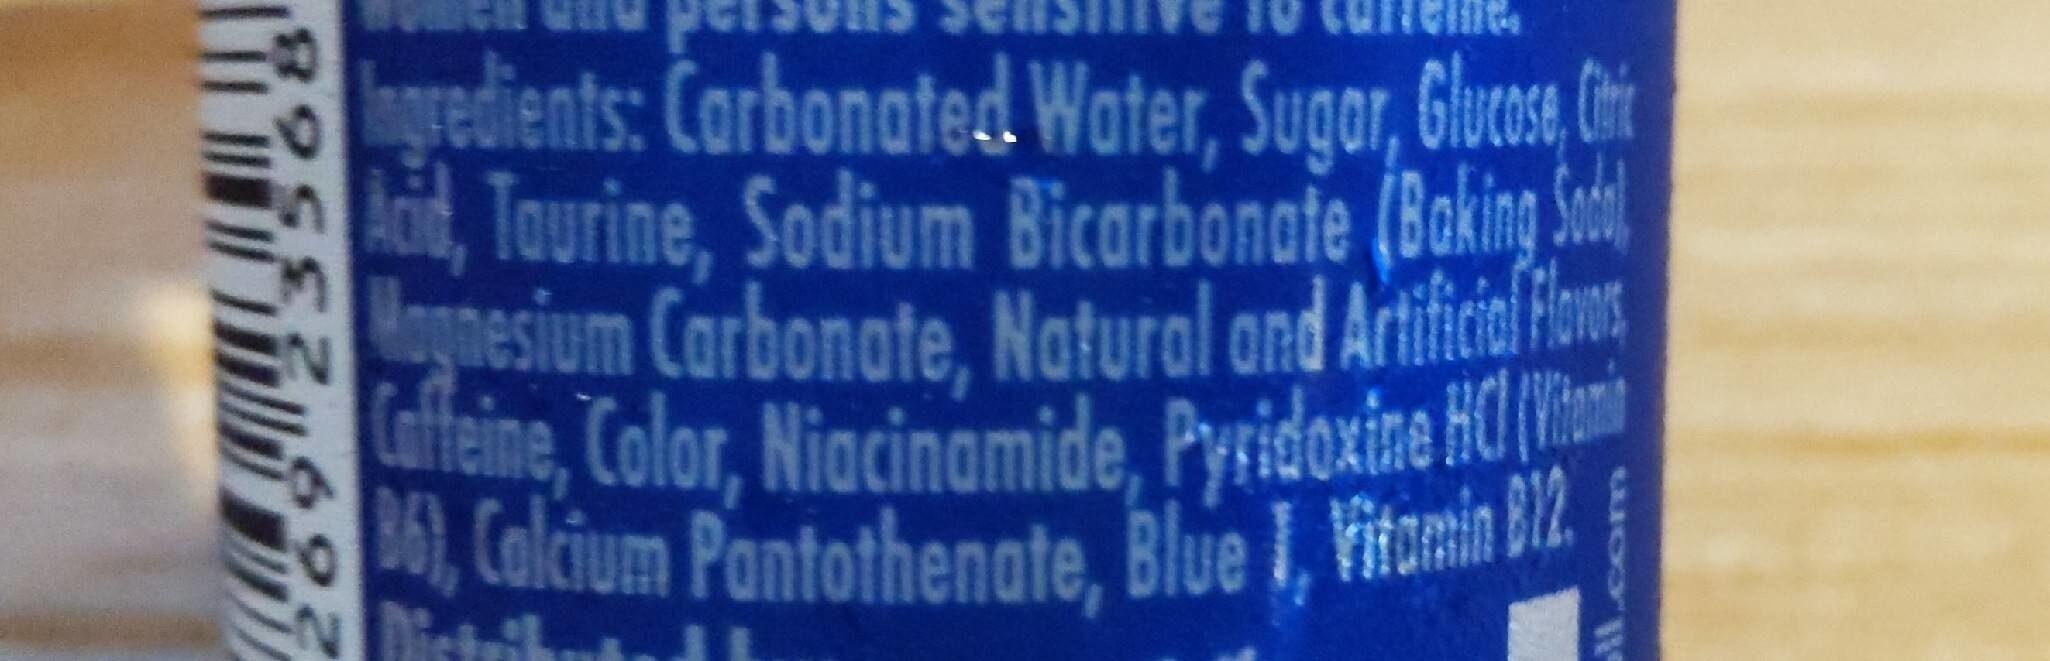 Blue edition energy drink - Nutrition facts - en